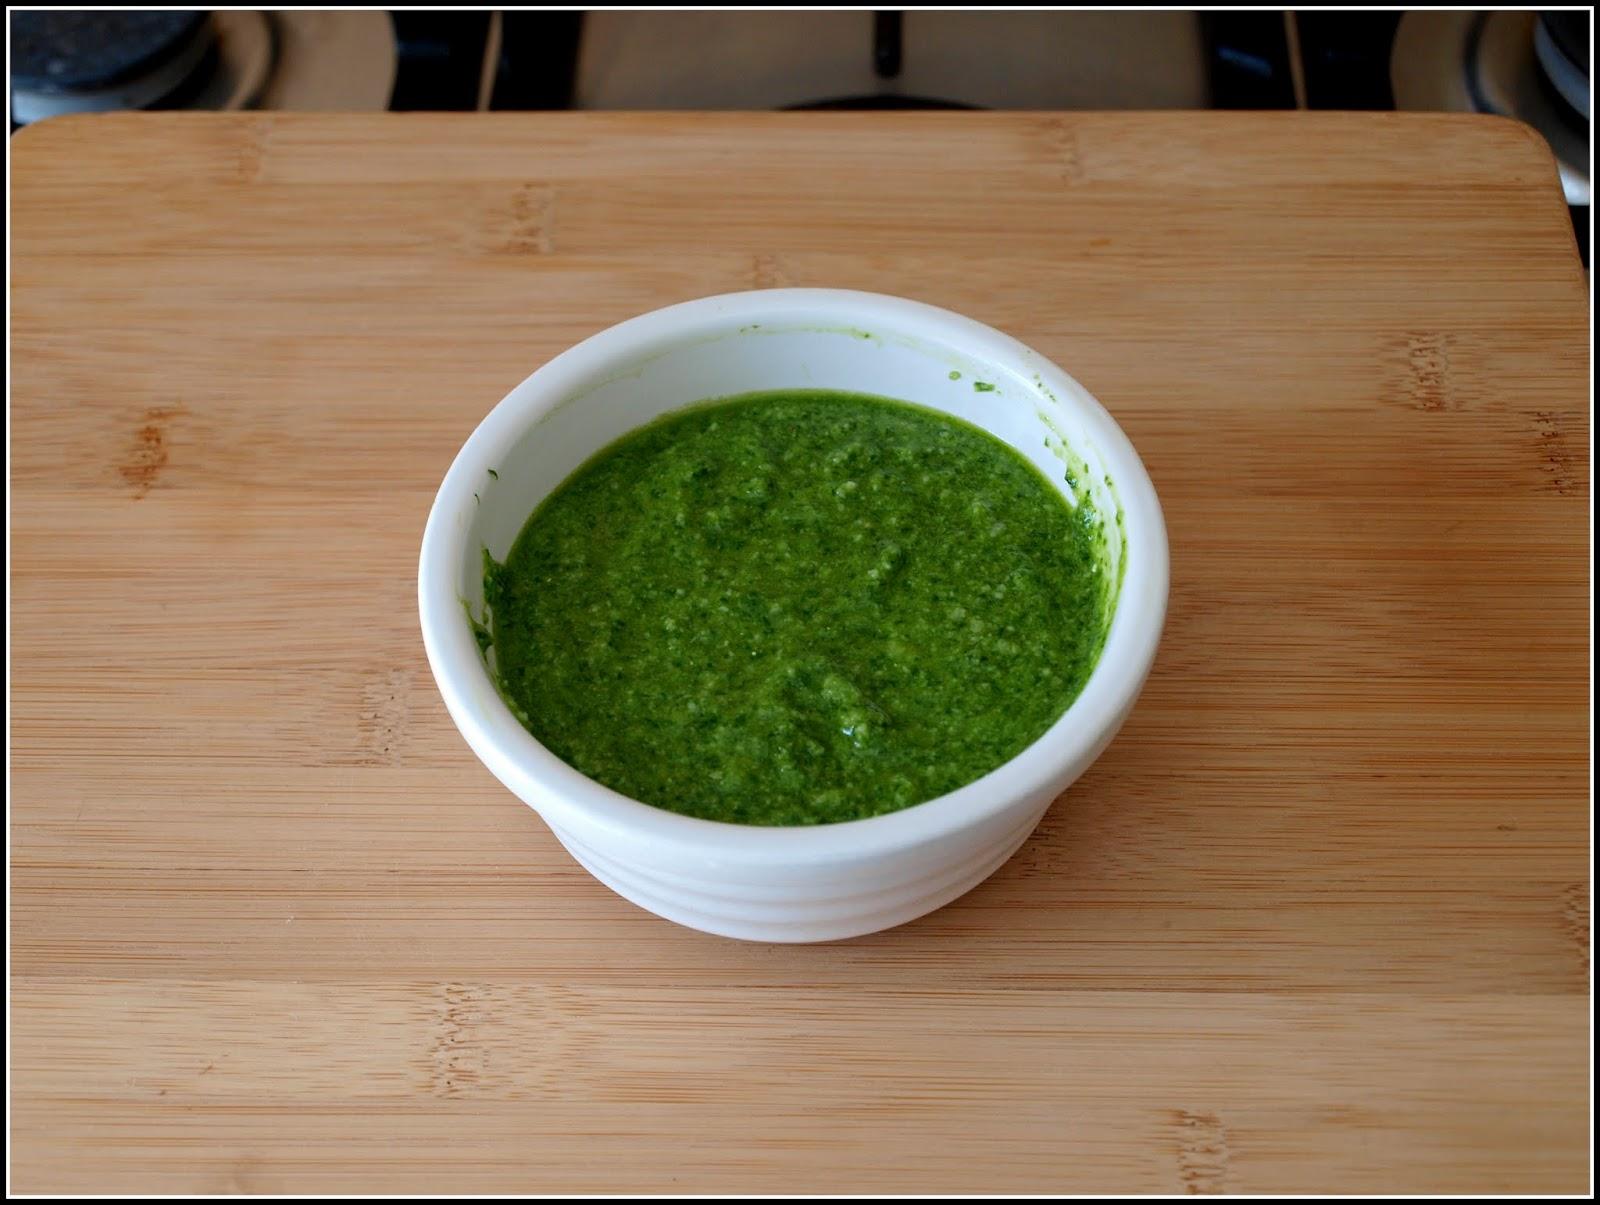 Mark's Veg Plot: Wild Garlic Pesto